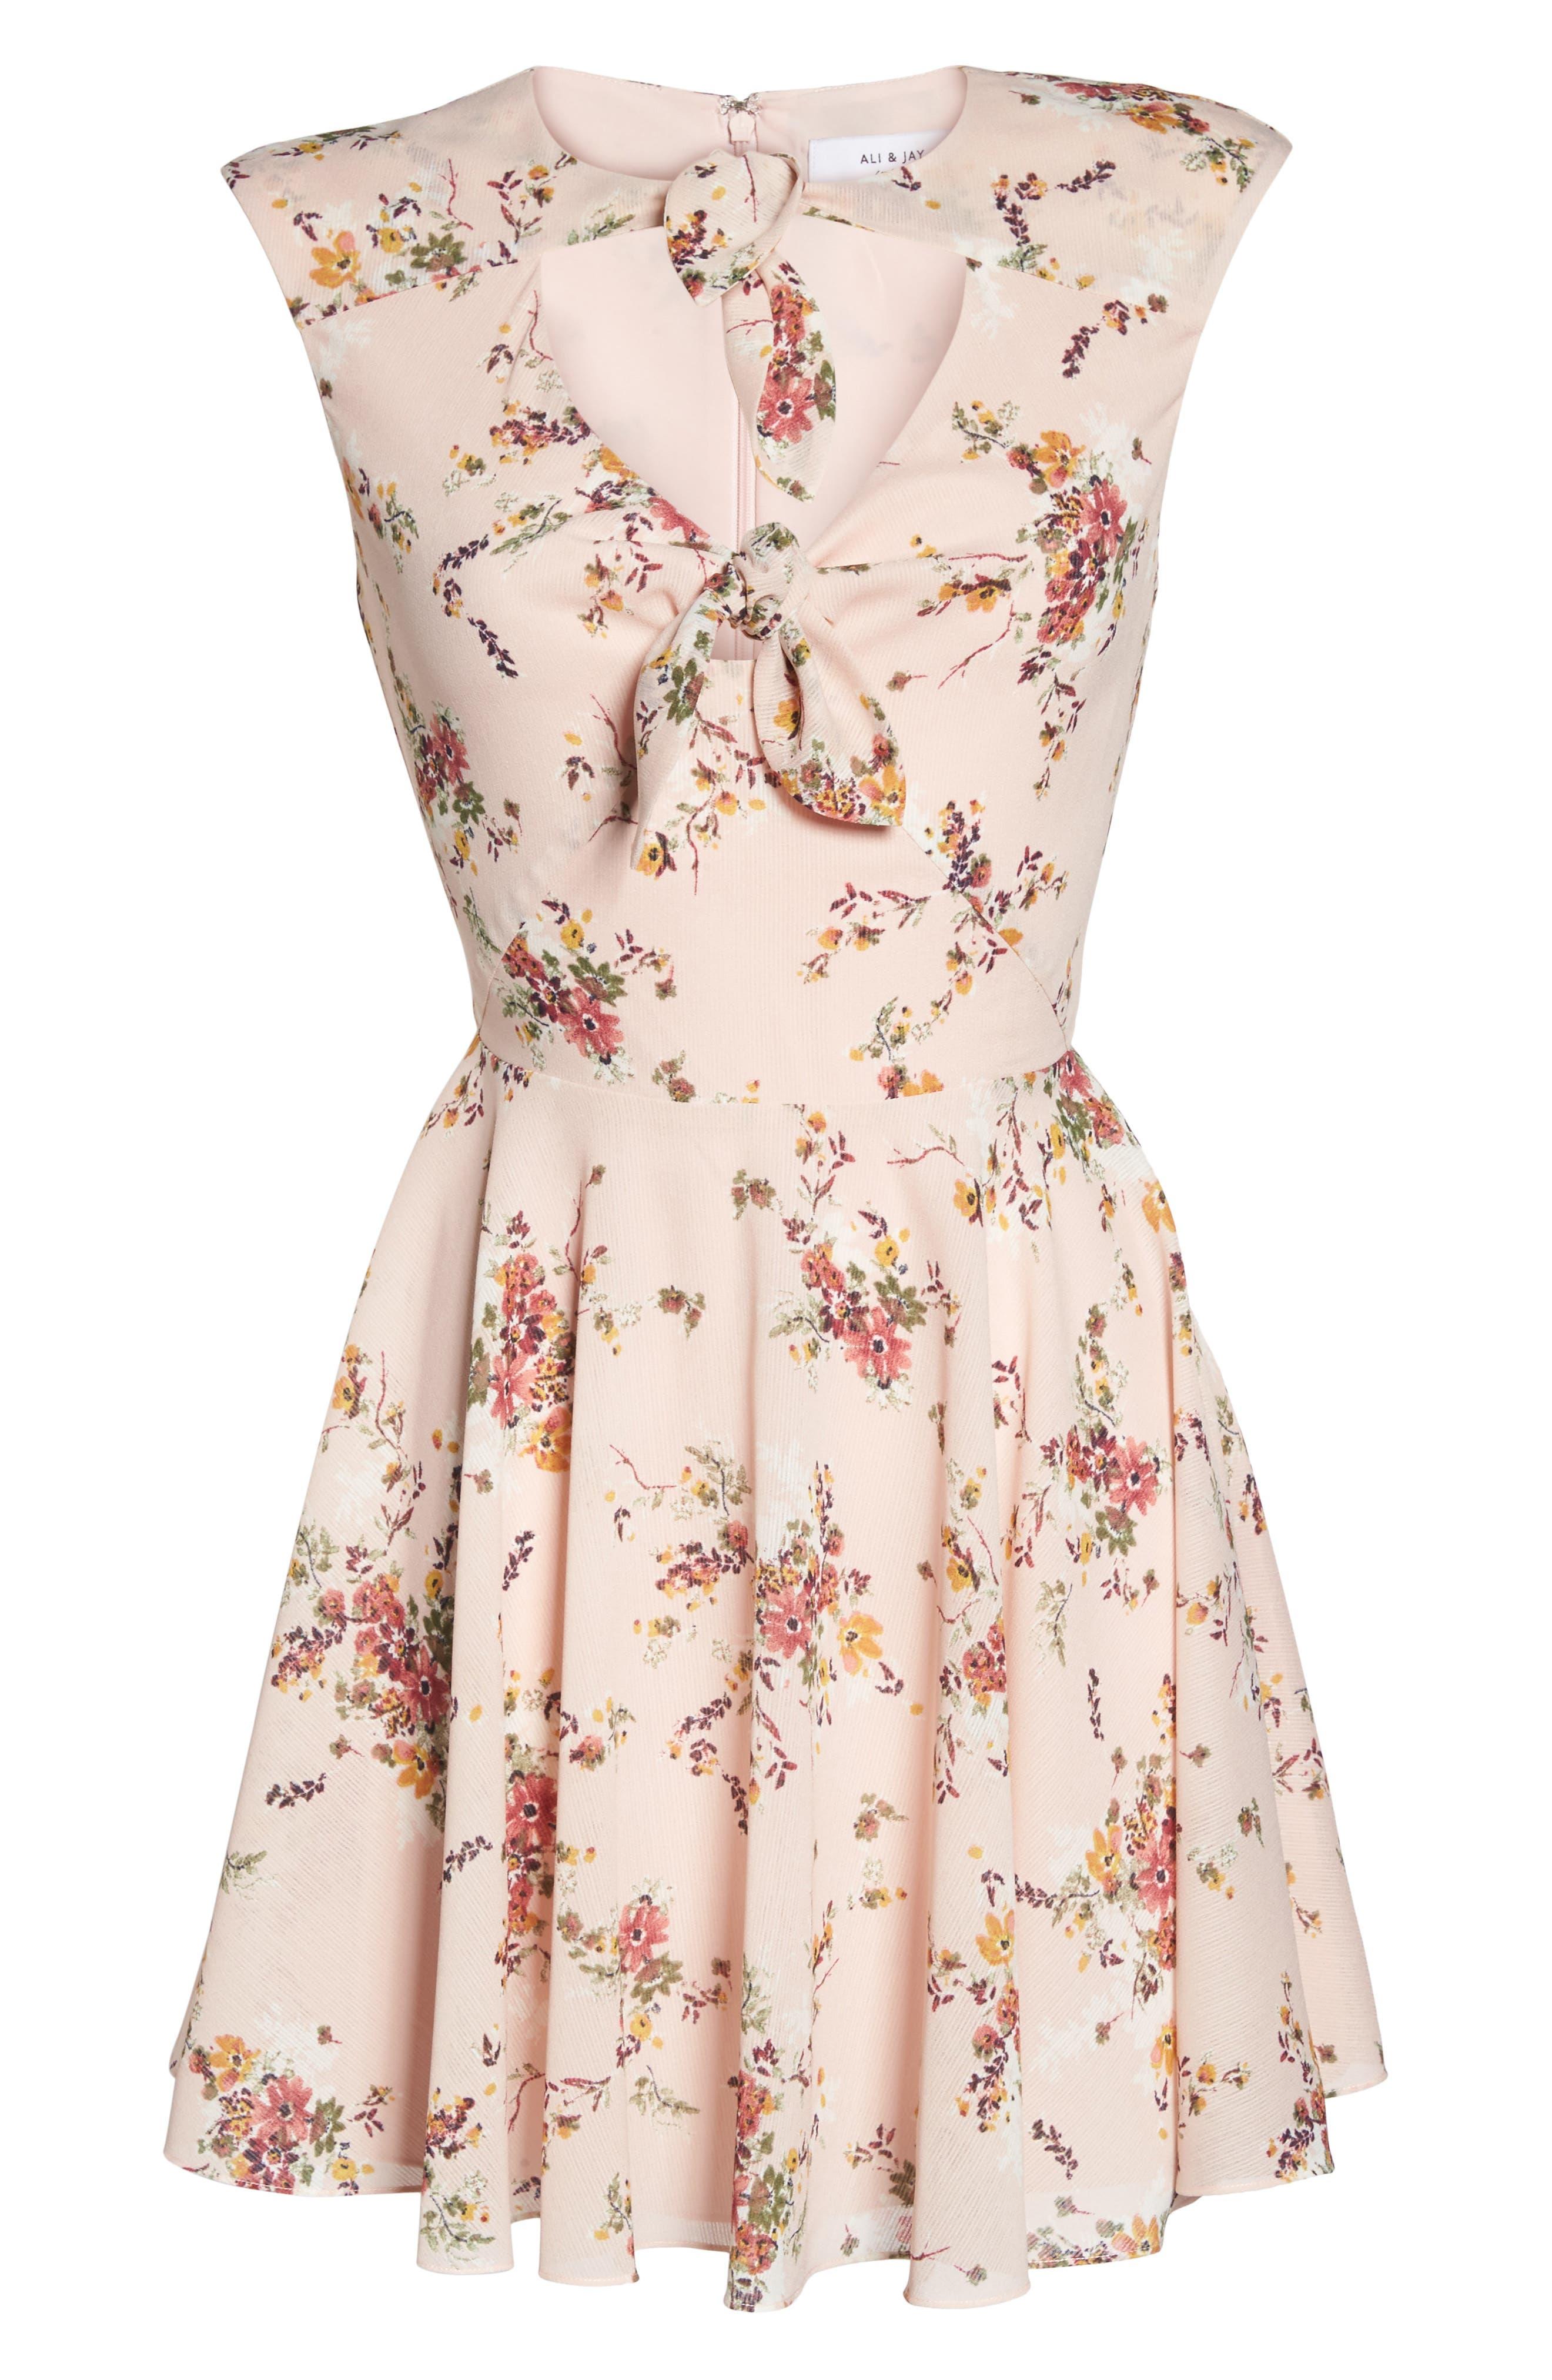 El Cid Floral Tie Front Minidress,                             Alternate thumbnail 7, color,